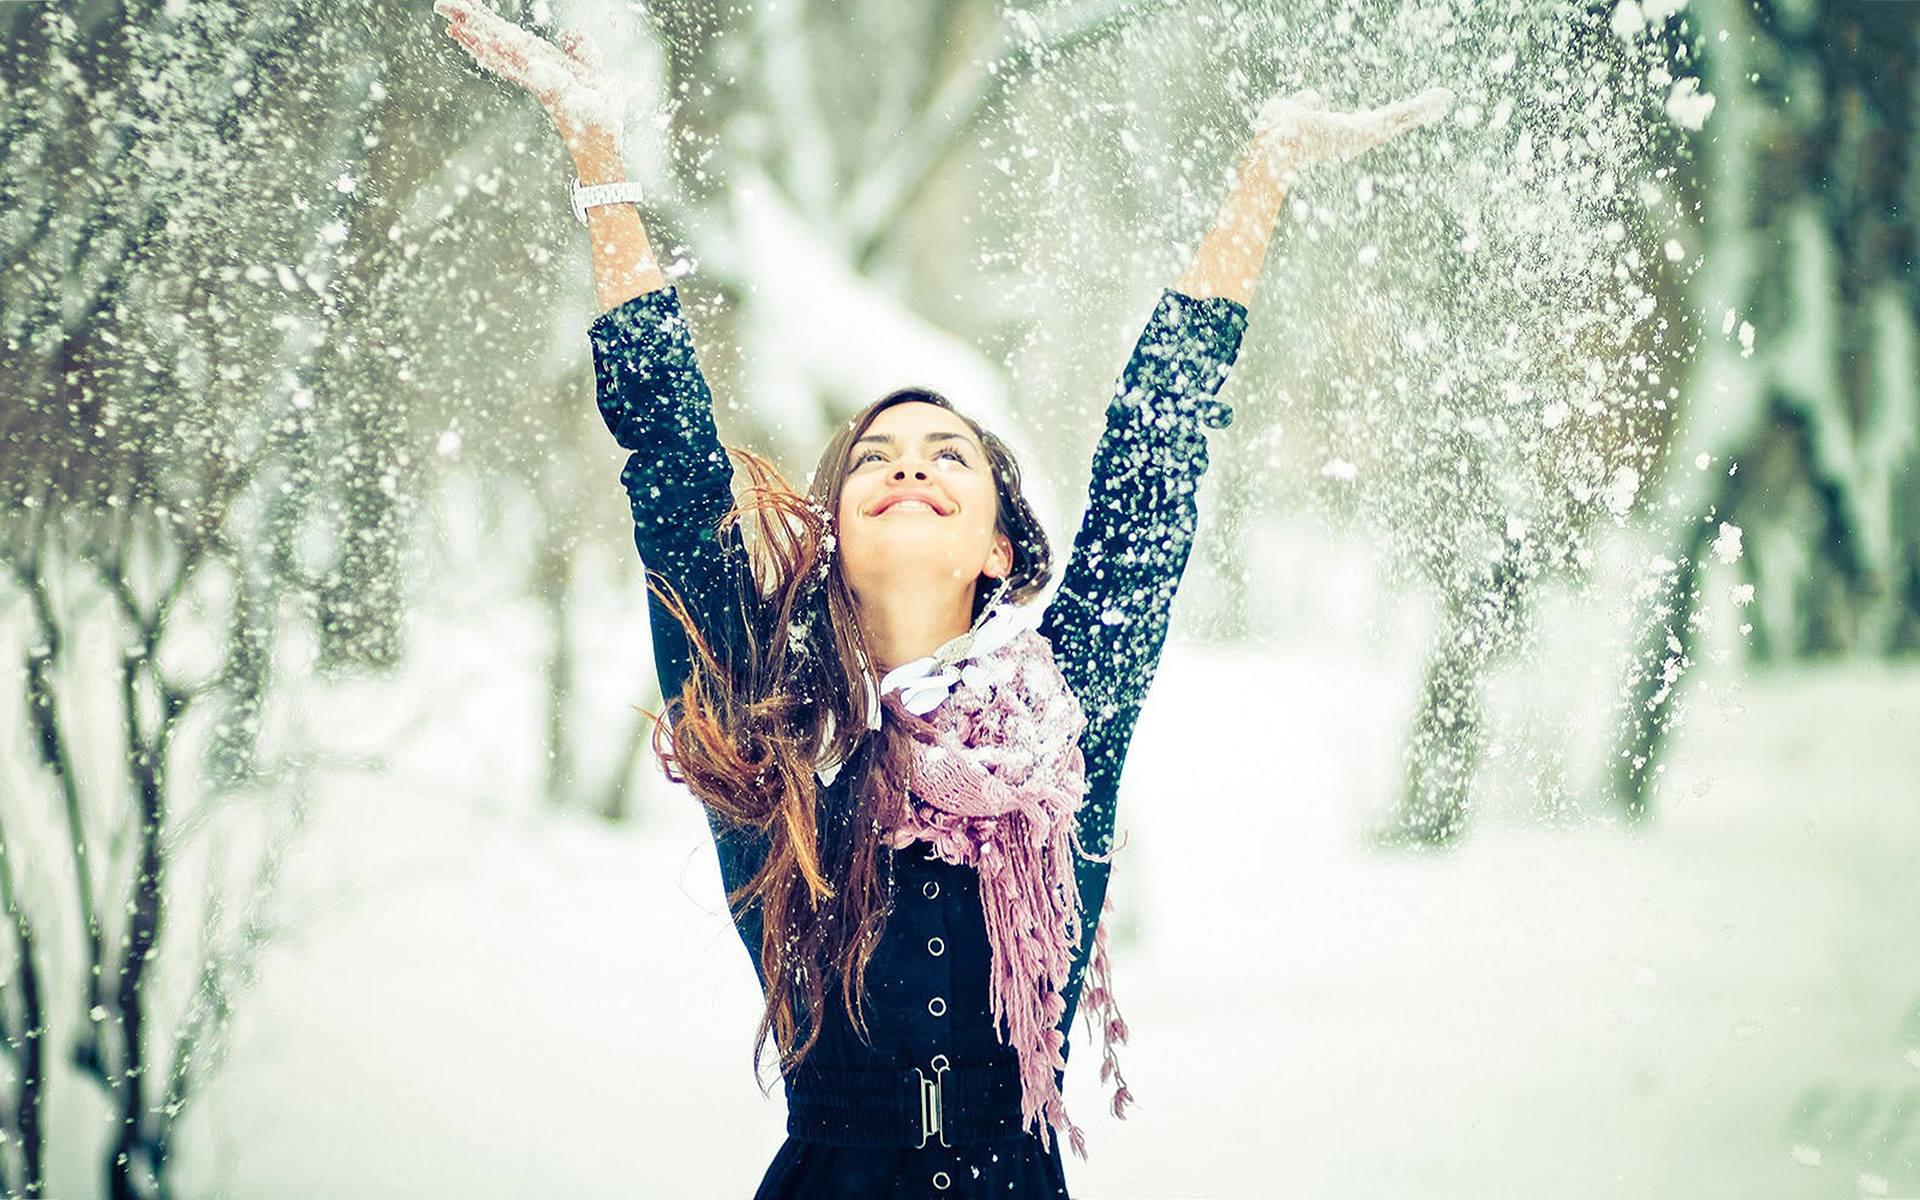 Most Inspiring Wallpaper Love Winter - 12334125_786217974817009_1379557116_o  HD_261397.jpg